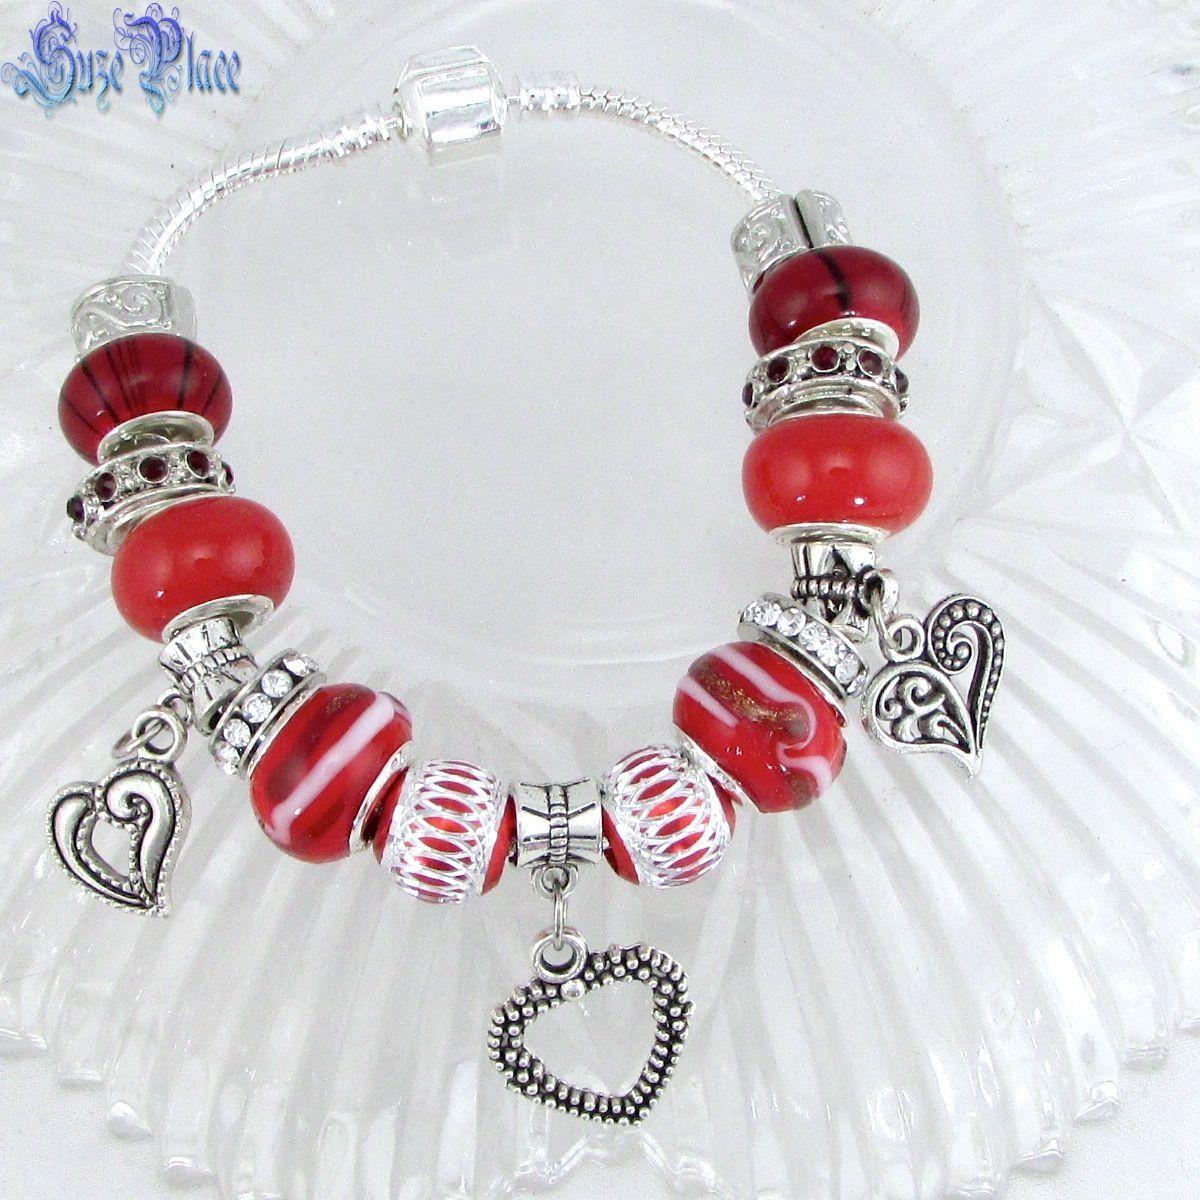 Pin by Angela Heath on Bracelets, Silver charms